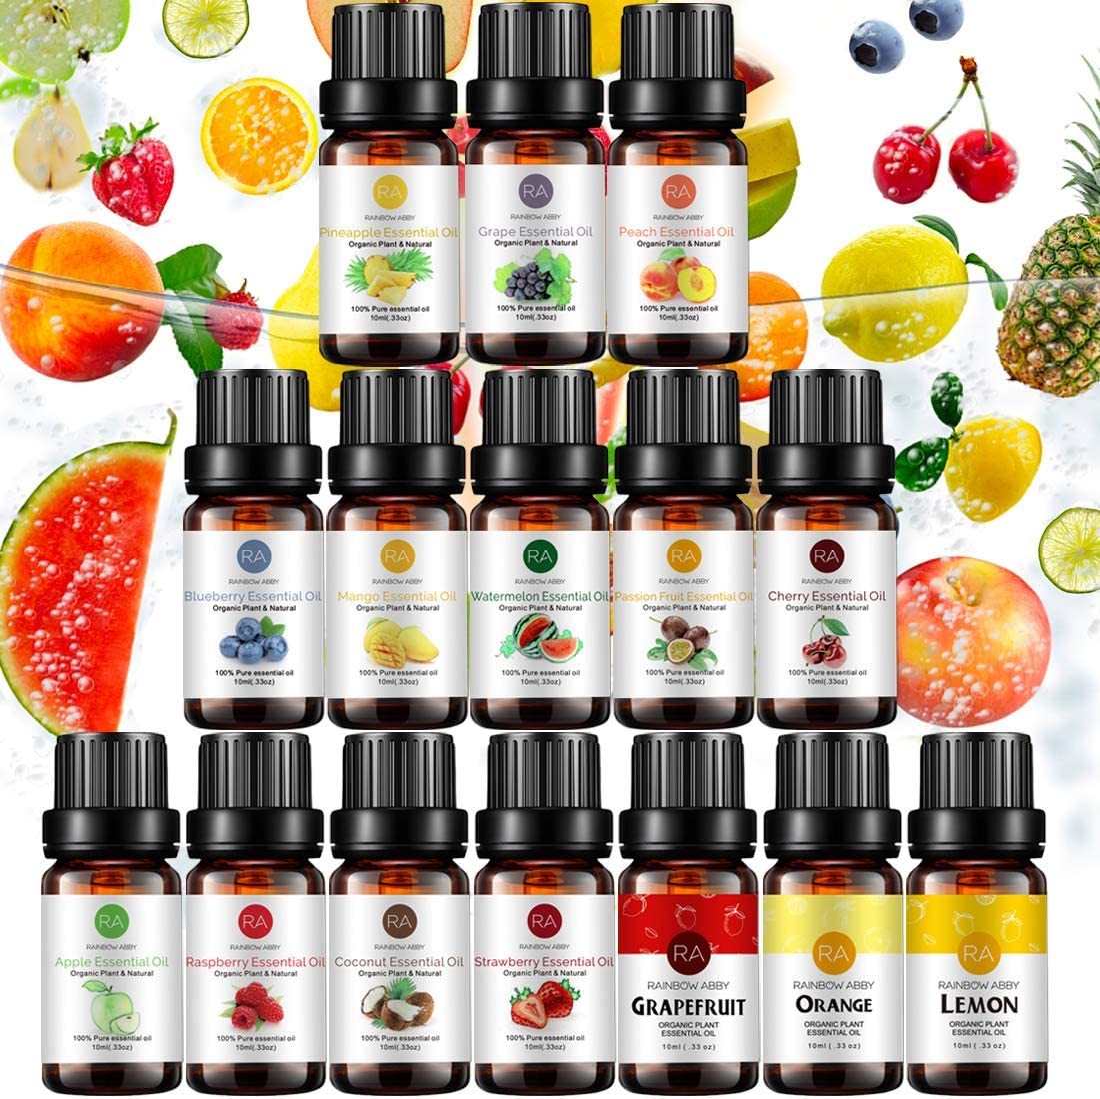 Top 15 Fruit Essential Oil Set 10ml, Aromatherapy 100% Pure Essential Oil (Grapefruit, Coconut, Peach, Strawberry, Mango, Apple, Watermelon, Orange, Lemon, Cherry, Pineapple, Blueberry, Grape, etc.)